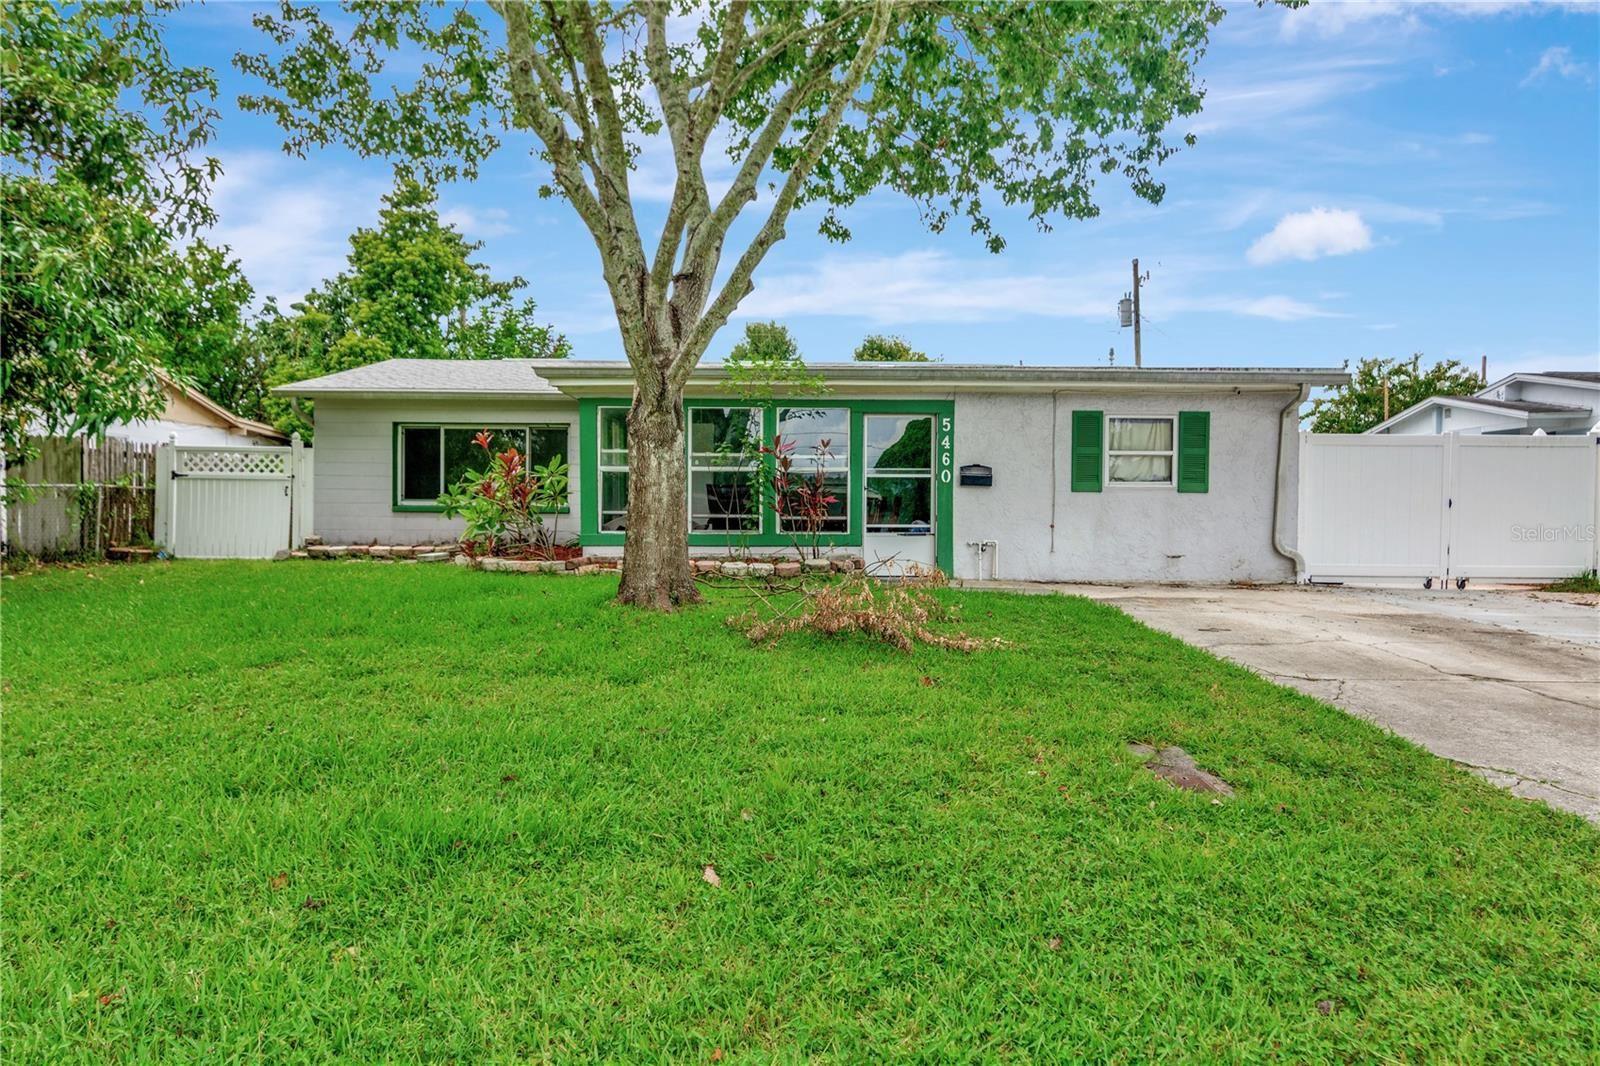 5460 97TH TERRACE N, Pinellas Park, FL 33782 - #: U8131884